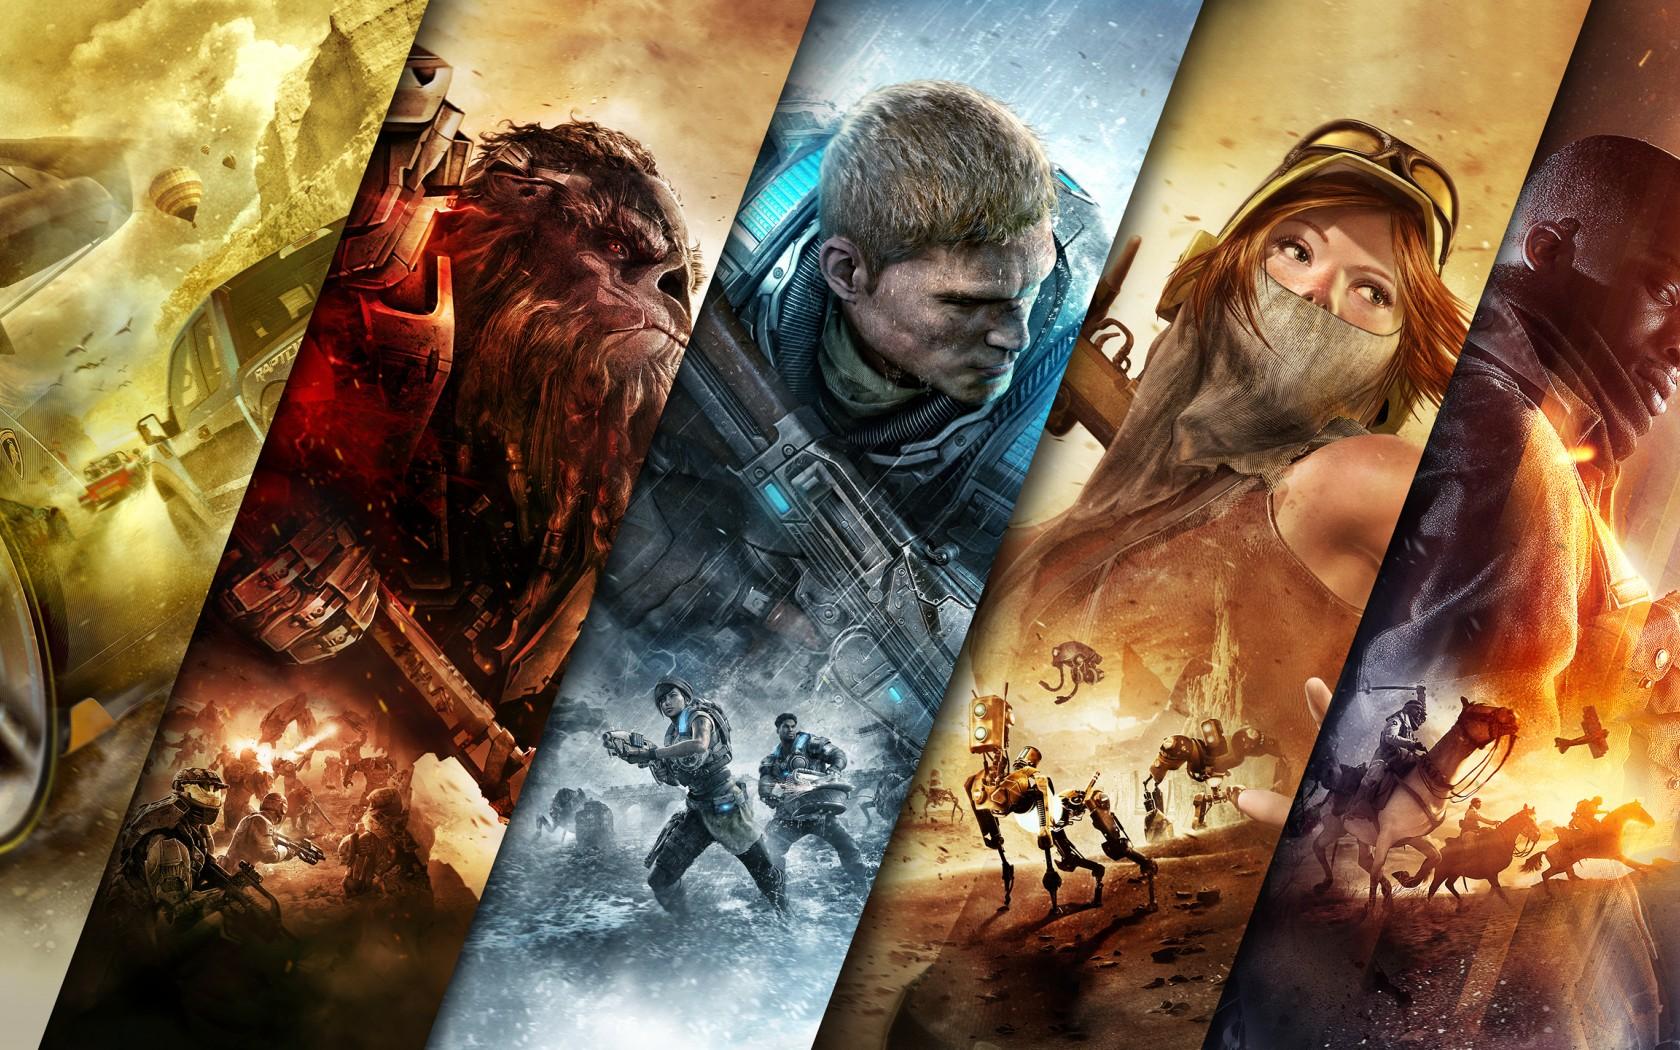 Forza Horizon 3 Halo Wars 2 Gears Of War 4 Wallpaper Hd Games